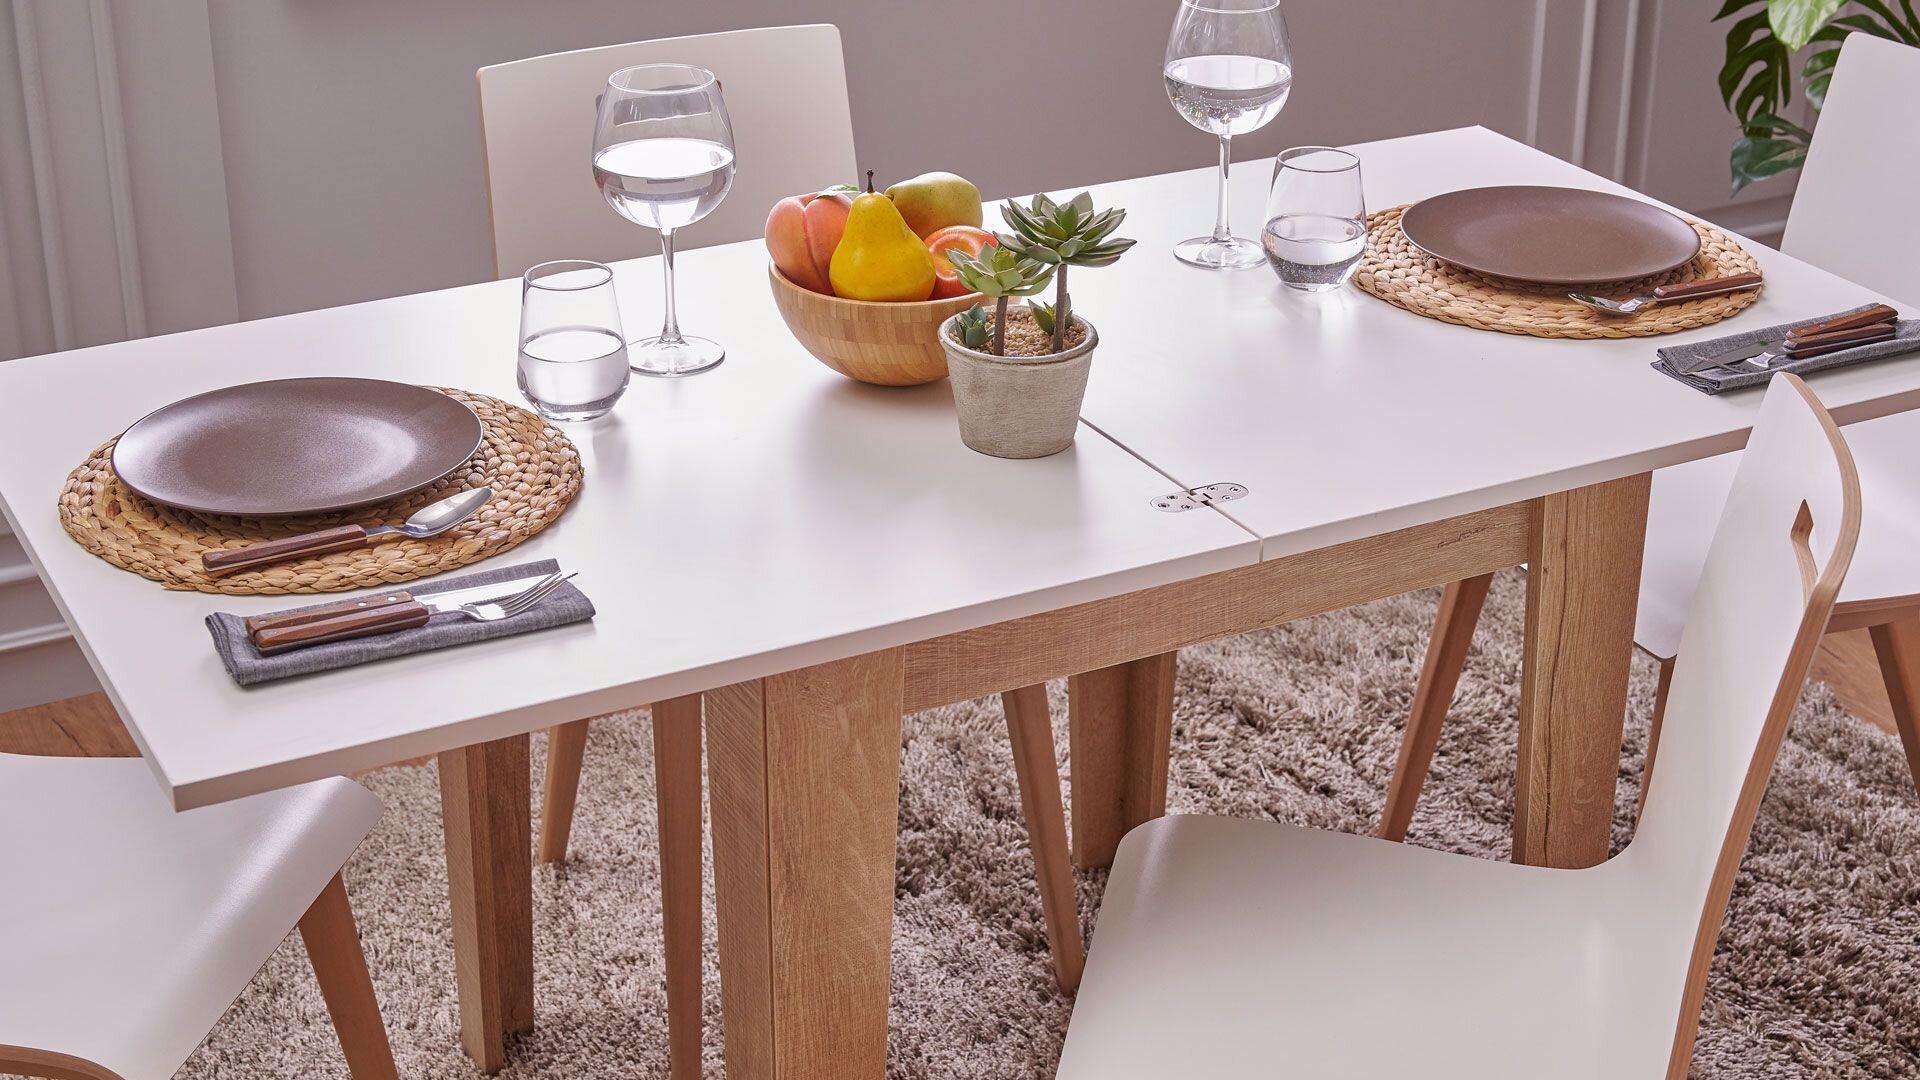 Redoro Mutfak Masa Ve Sandalyeleri